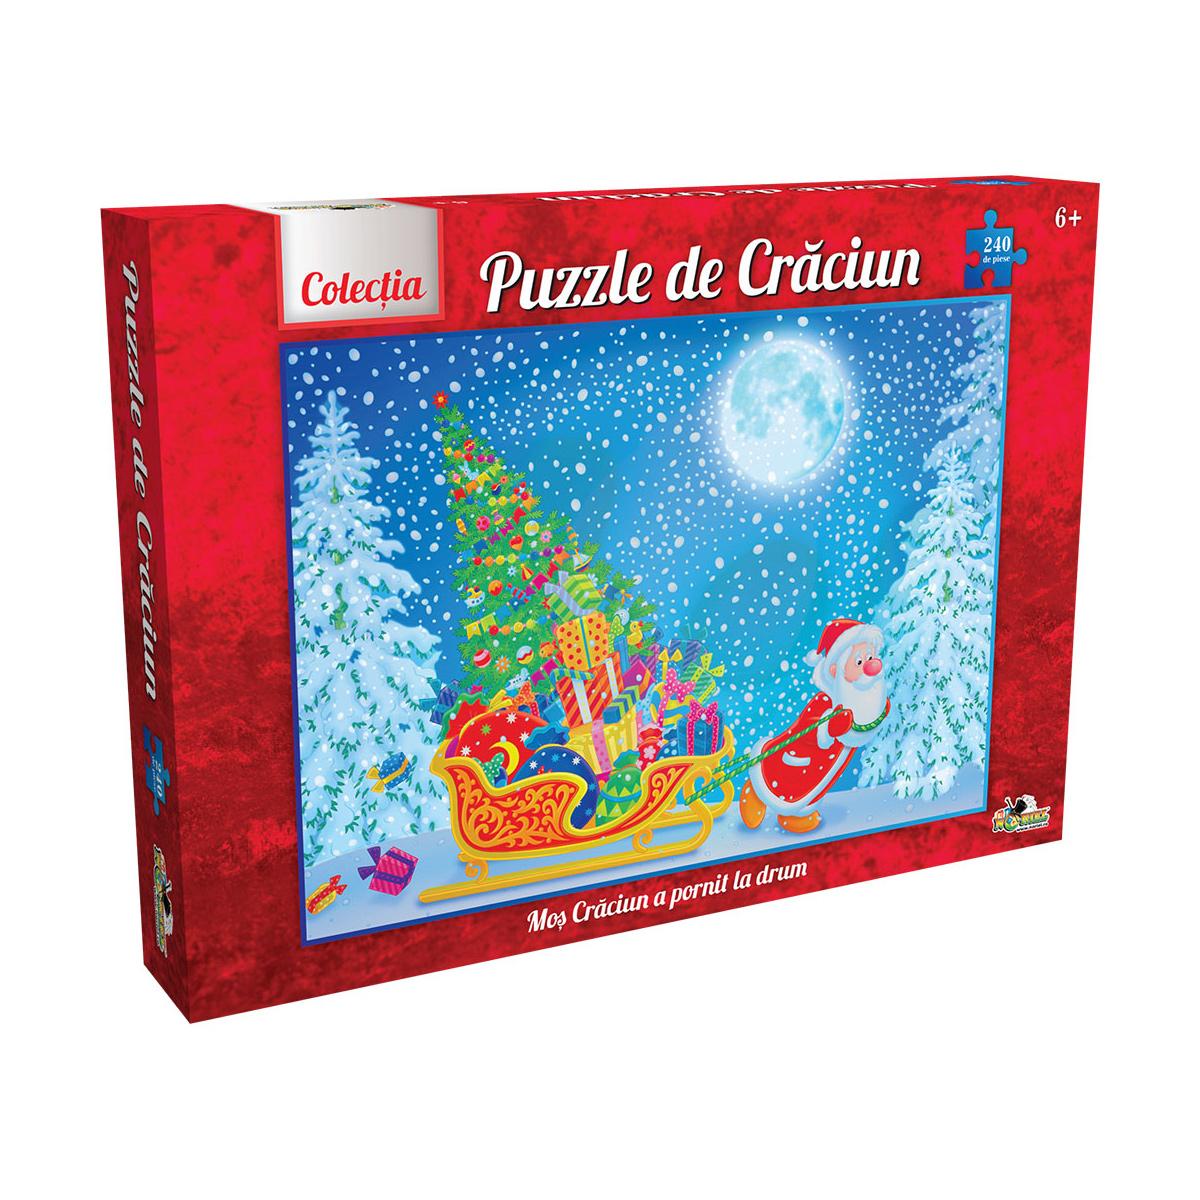 puzzle noriel colectia de craciun - mos craciun a pornit la drum, 240 piese